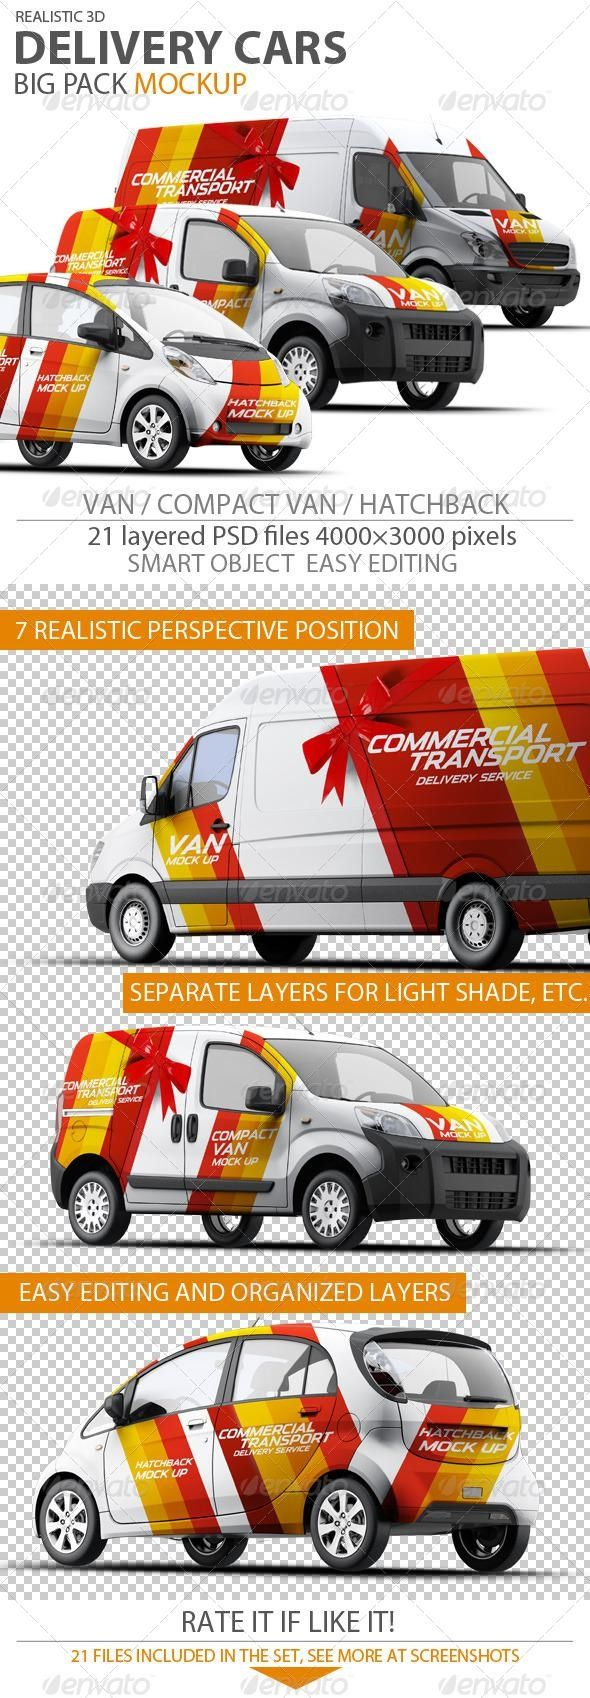 Cars Mockup for 8 mockups psd GraphicRiver